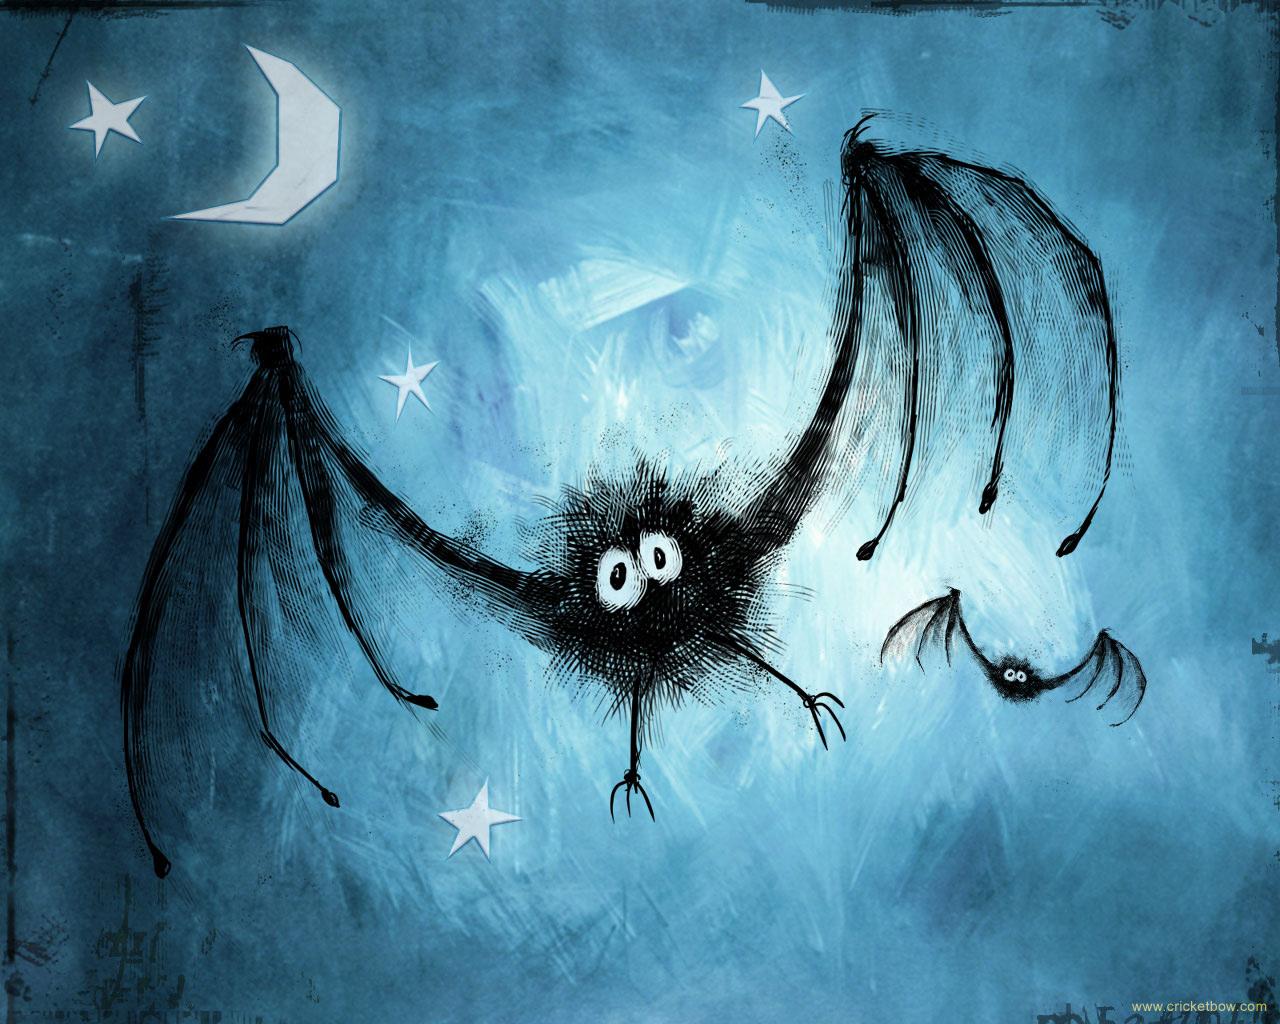 http://4.bp.blogspot.com/-ybB5kmabrGA/UHJDSxOsshI/AAAAAAAACIQ/0AibAi0cy6s/s1600/Halloween-Wallpaper-02.jpg